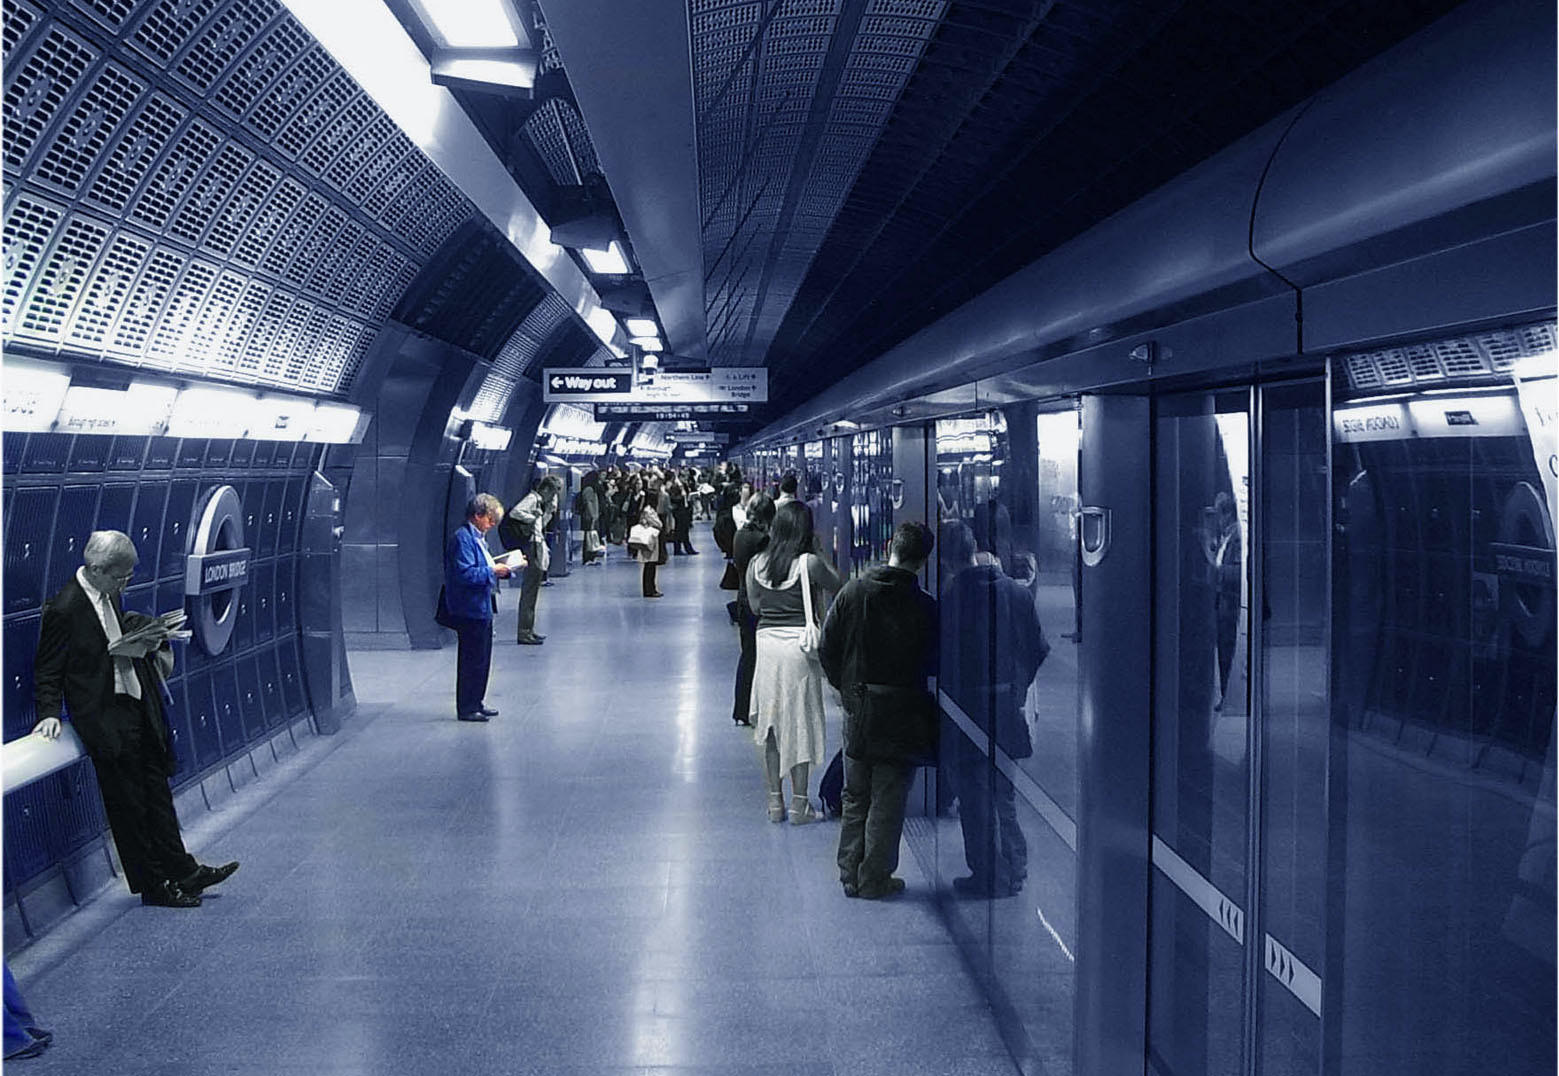 underground london by jameswesty